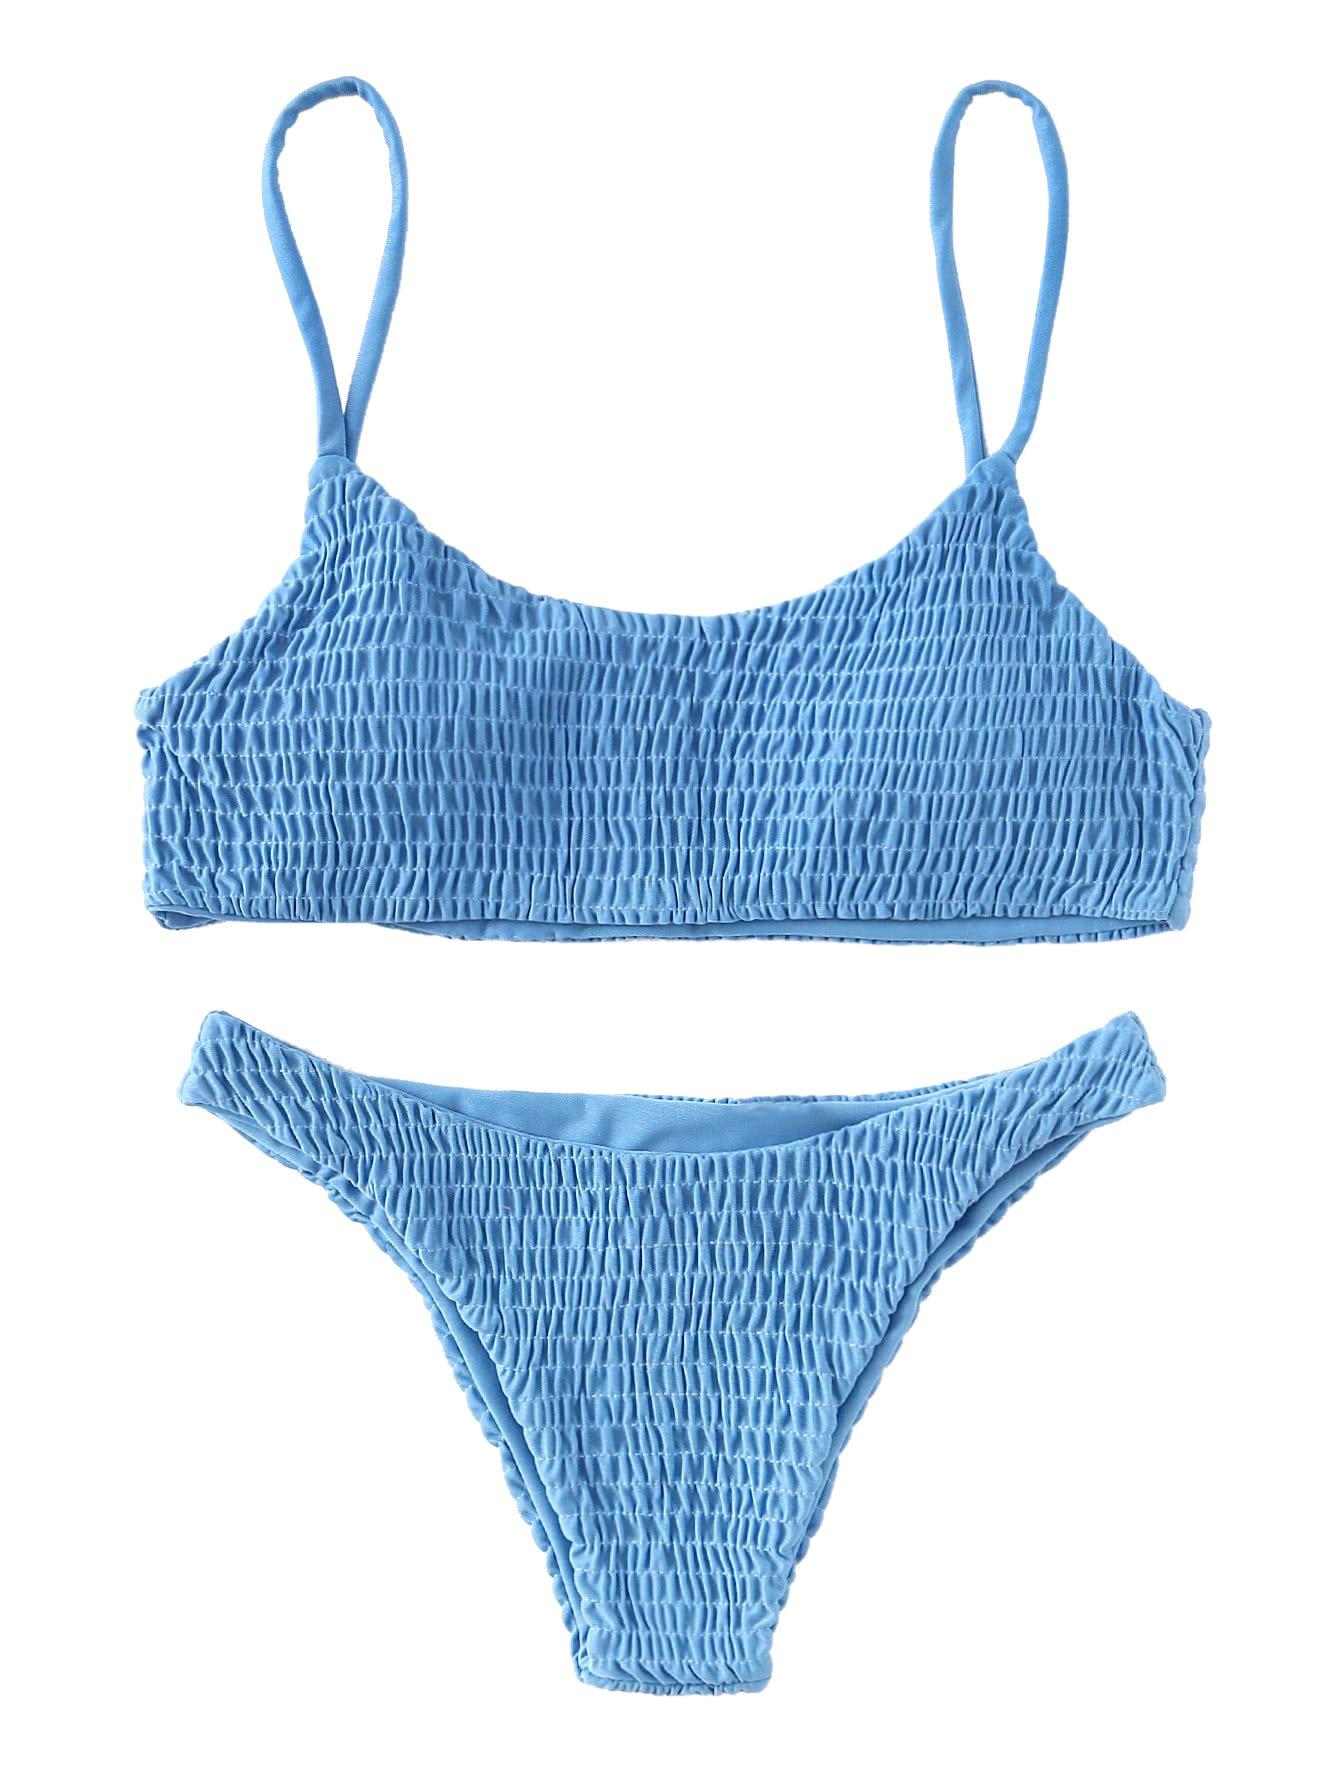 SweatyRocks Women's Sexy Bathing Suit Solid Color Halter Shirred Bikini Swimsuit Blue M